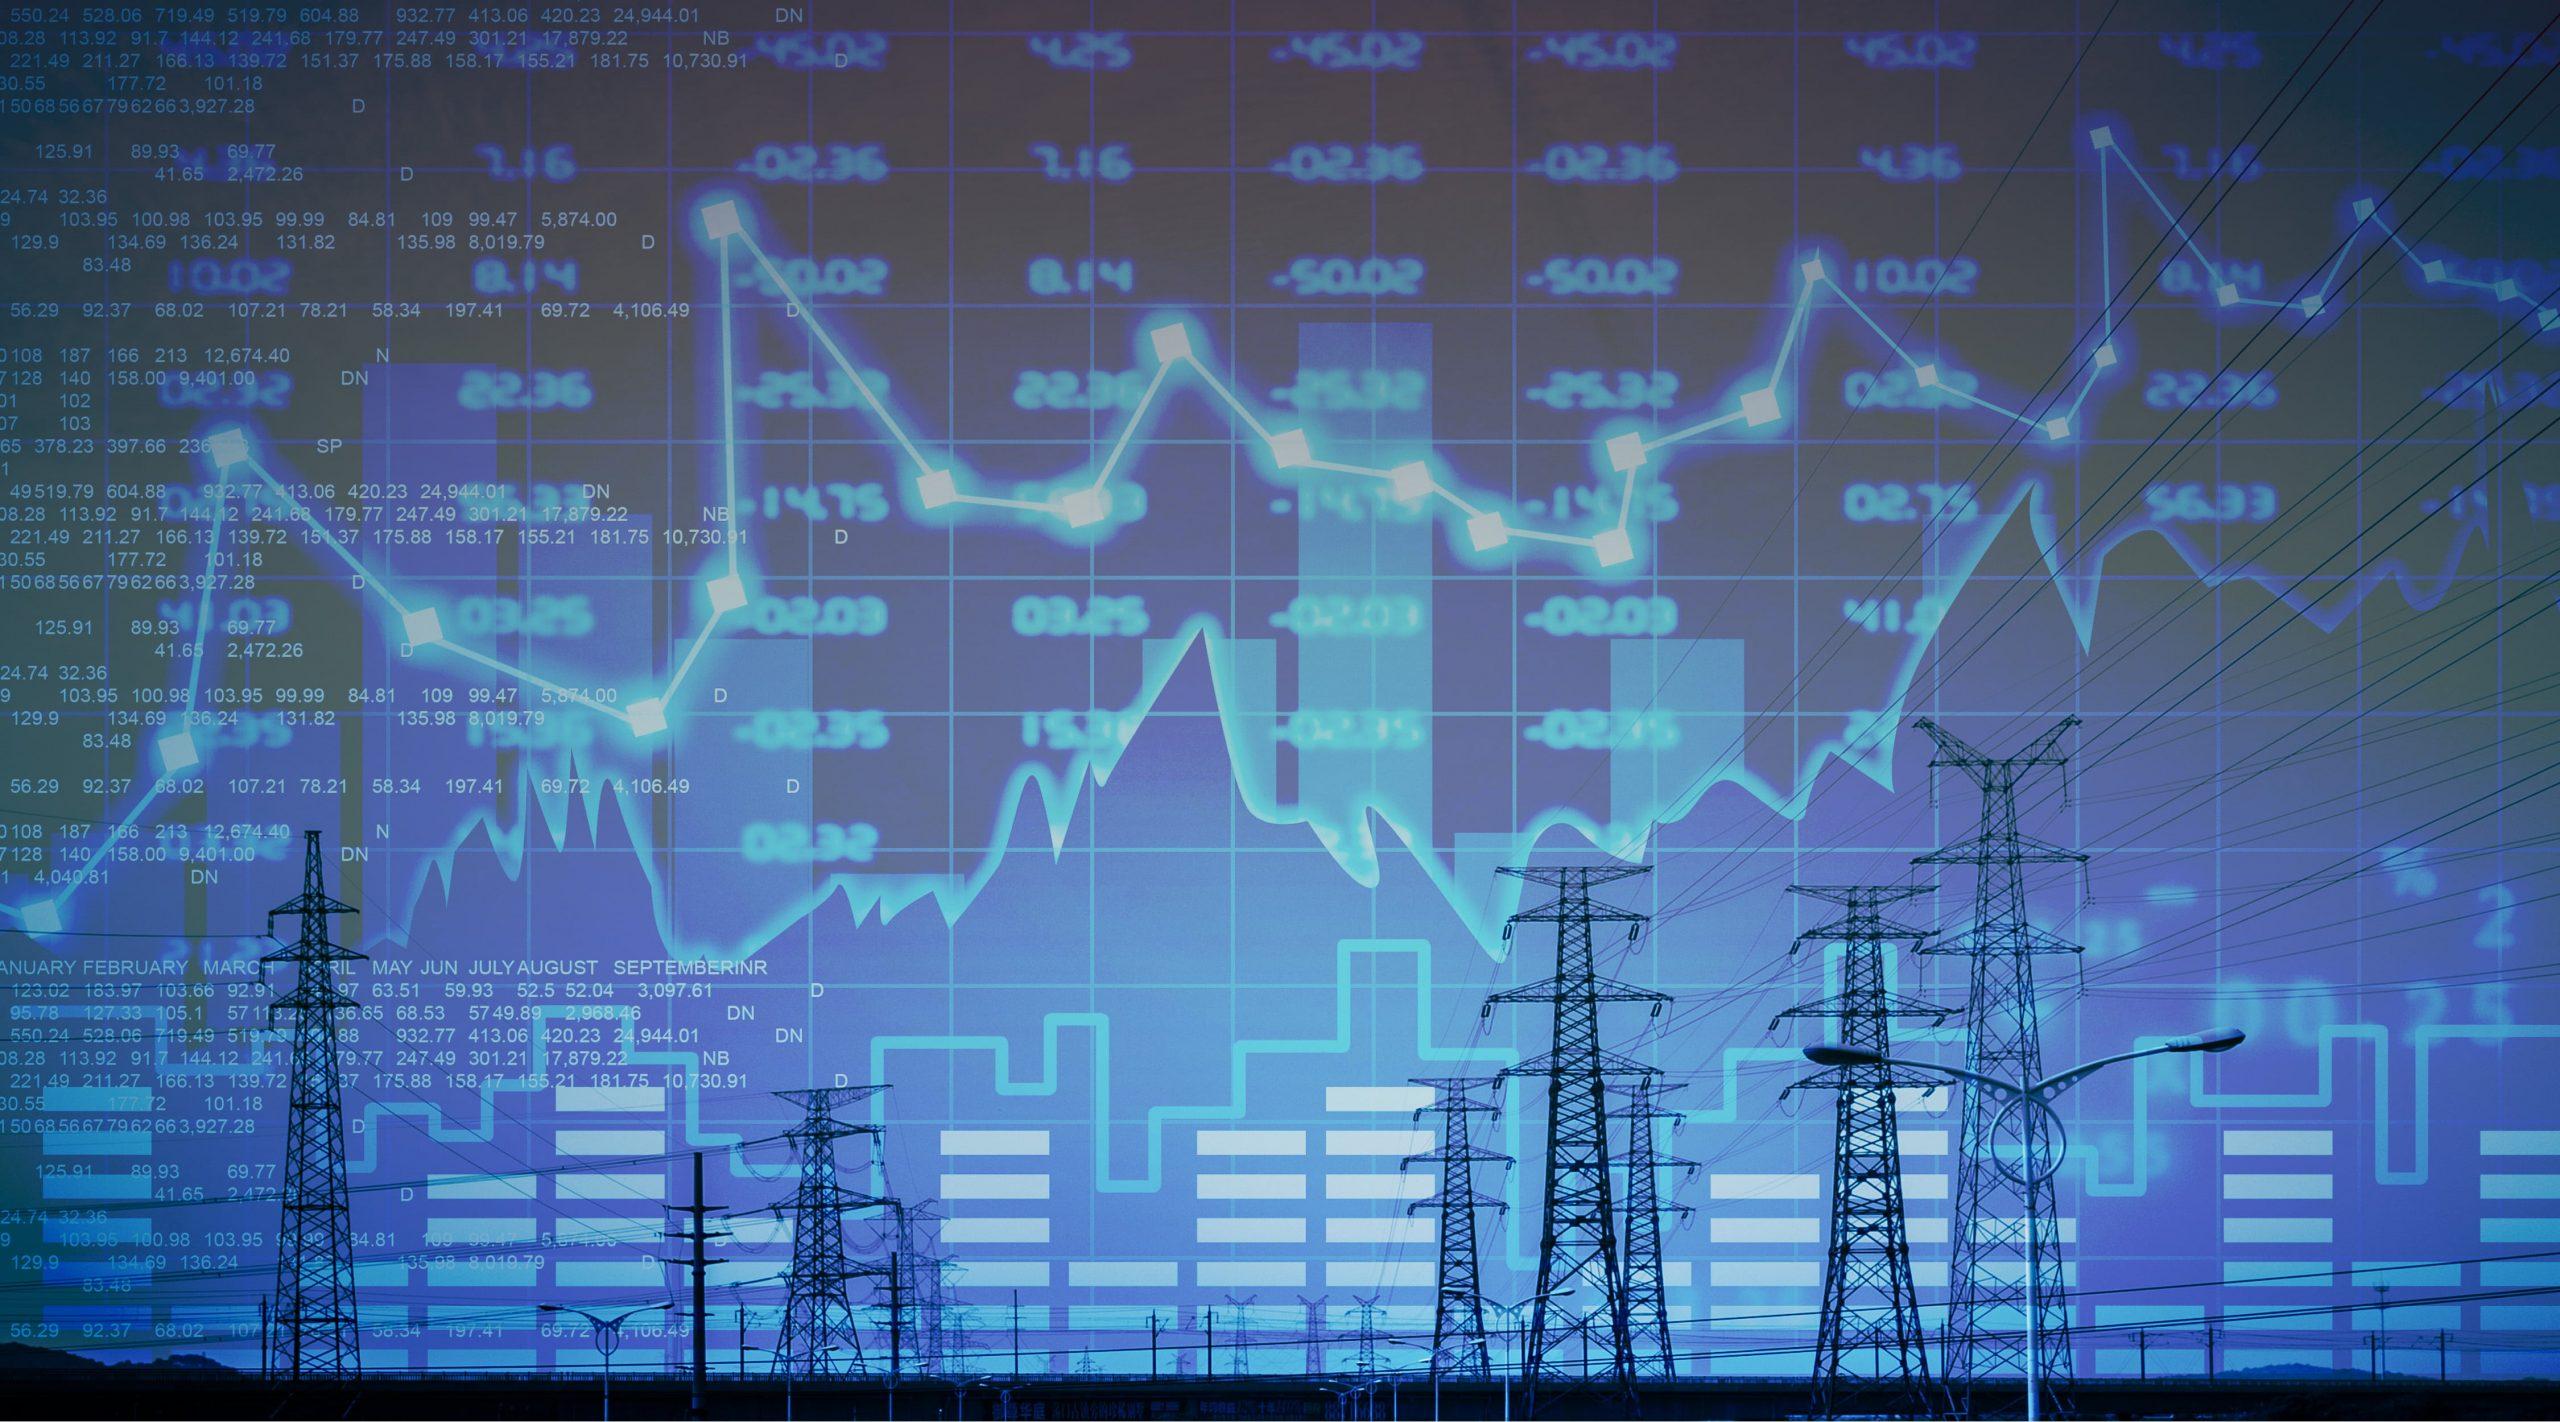 CERC Approves Petition of  Pranurja Solution  for Registration of Power Exchange